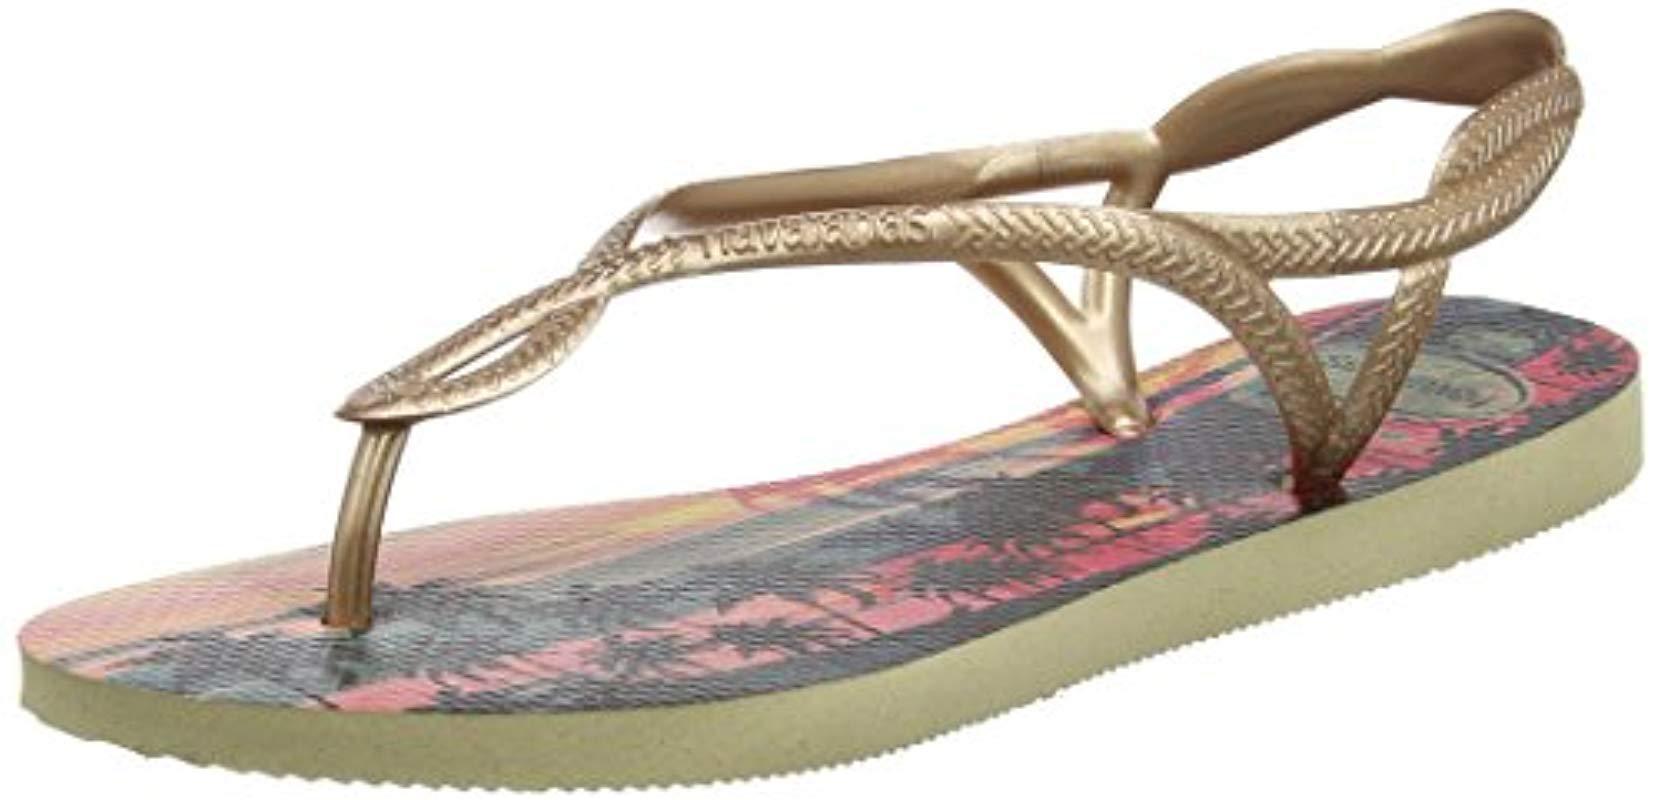 ccb0b03d21ef7 Havaianas. Women s Sandals Luna Print